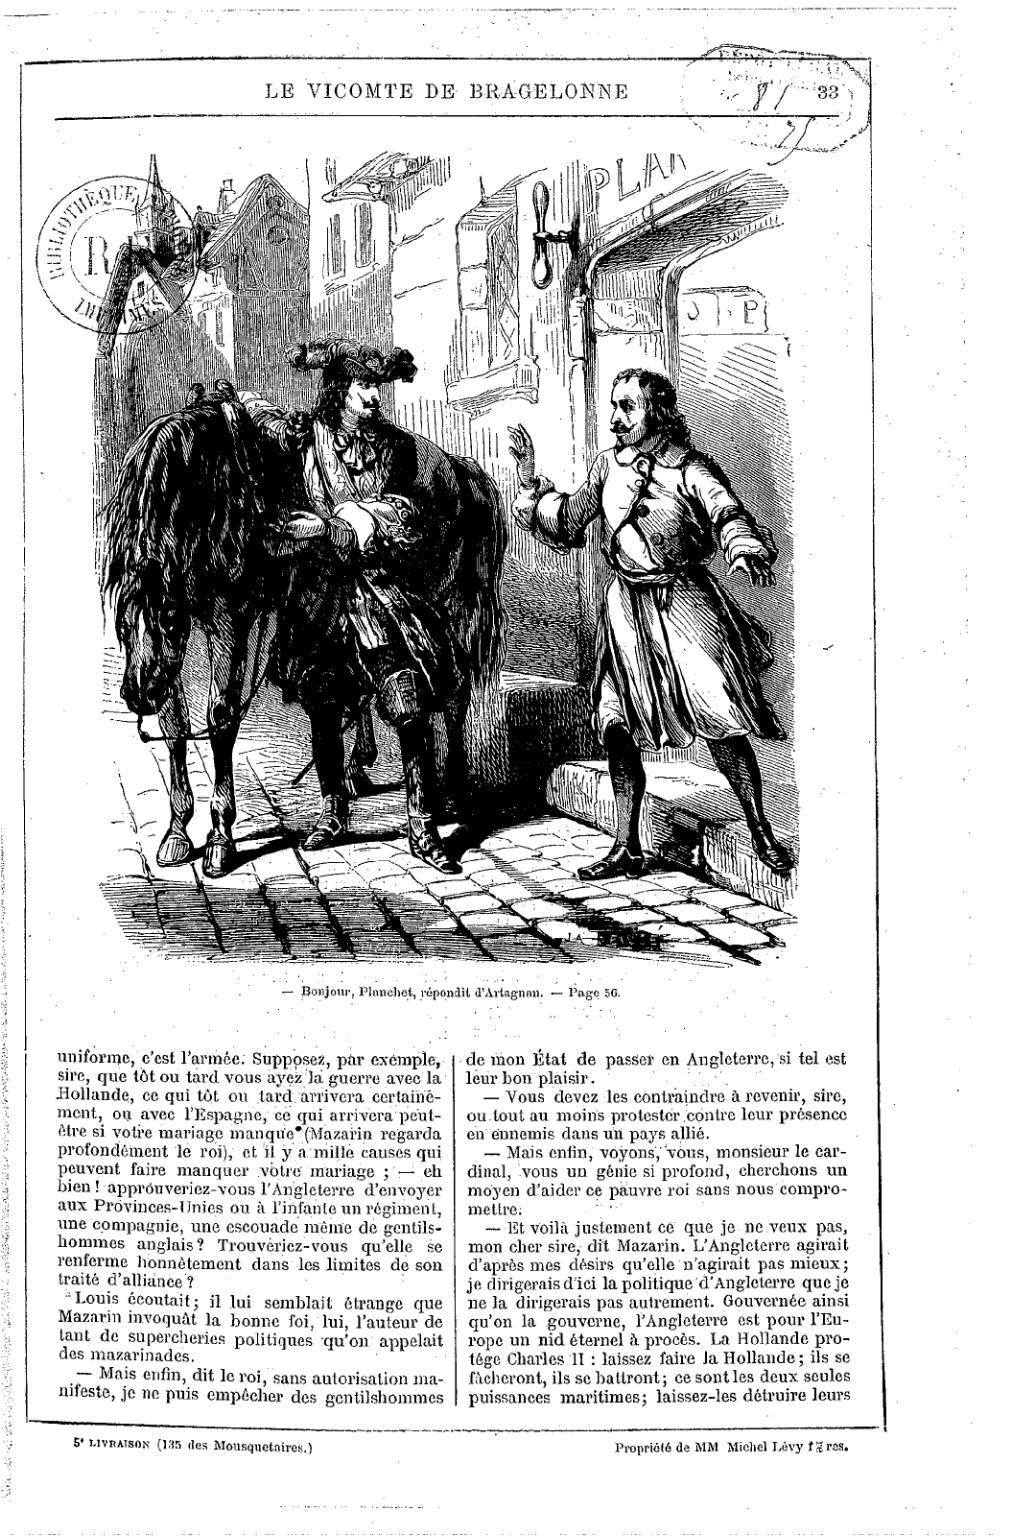 https://upload.wikimedia.org/wikipedia/commons/thumb/8/88/Dumas_-_Le_Vicomte_de_Bragelonne%2C_1876.djvu/page42-1024px-Dumas_-_Le_Vicomte_de_Bragelonne%2C_1876.djvu.jpg